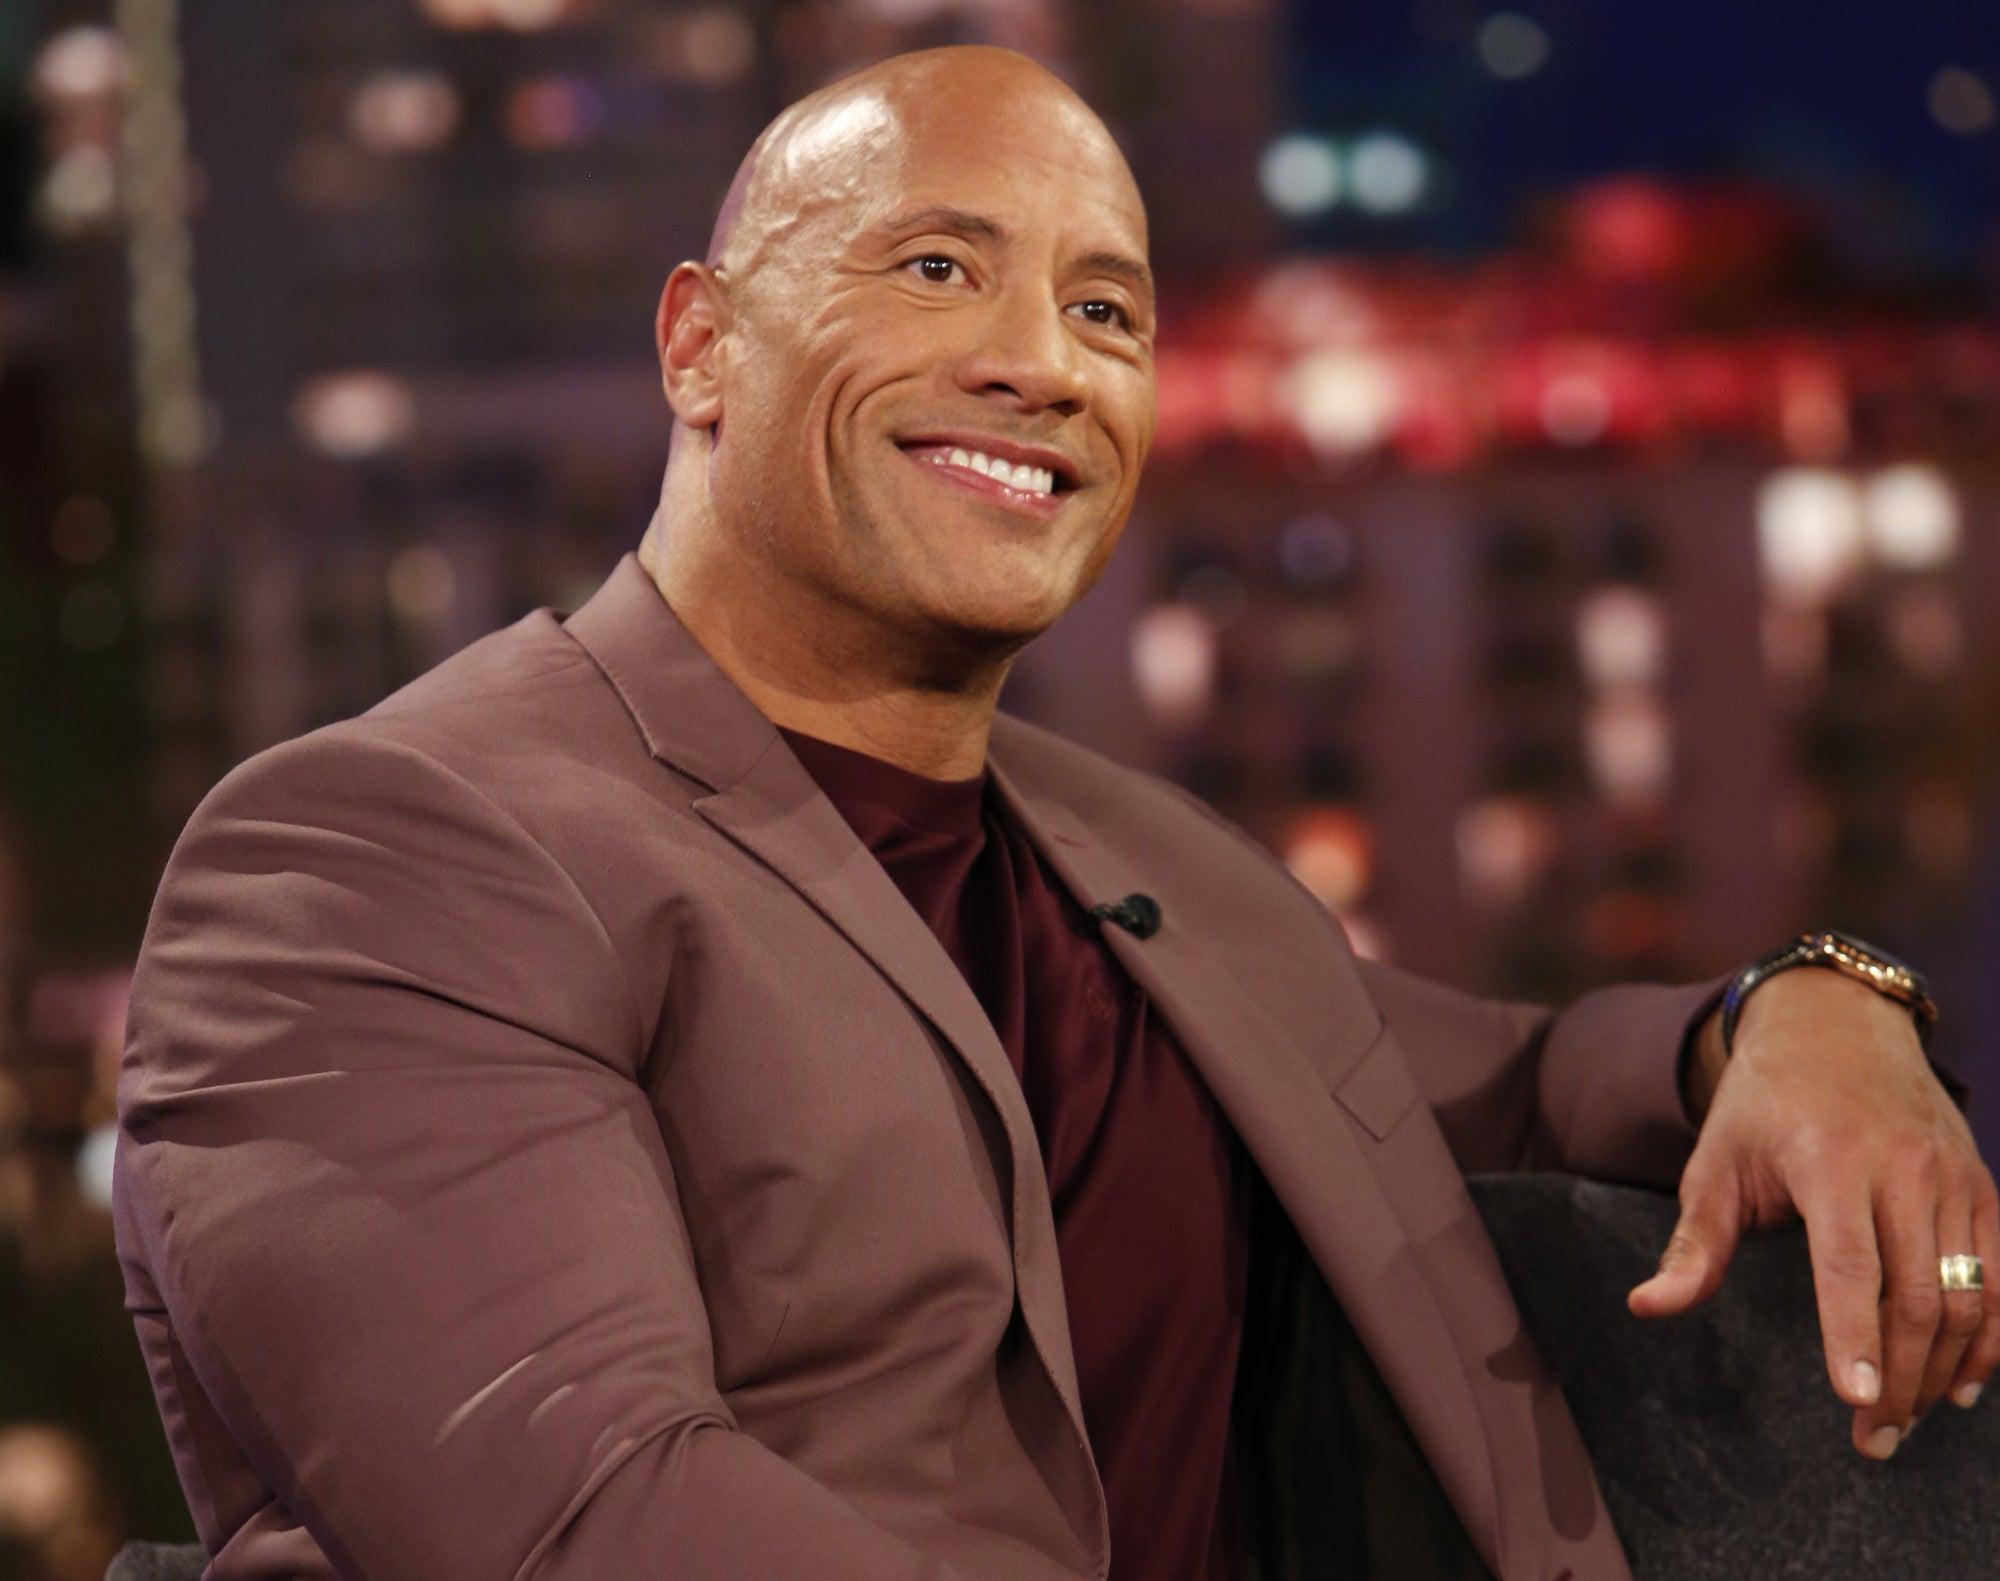 Dwayne Johnson smiles on a night show.